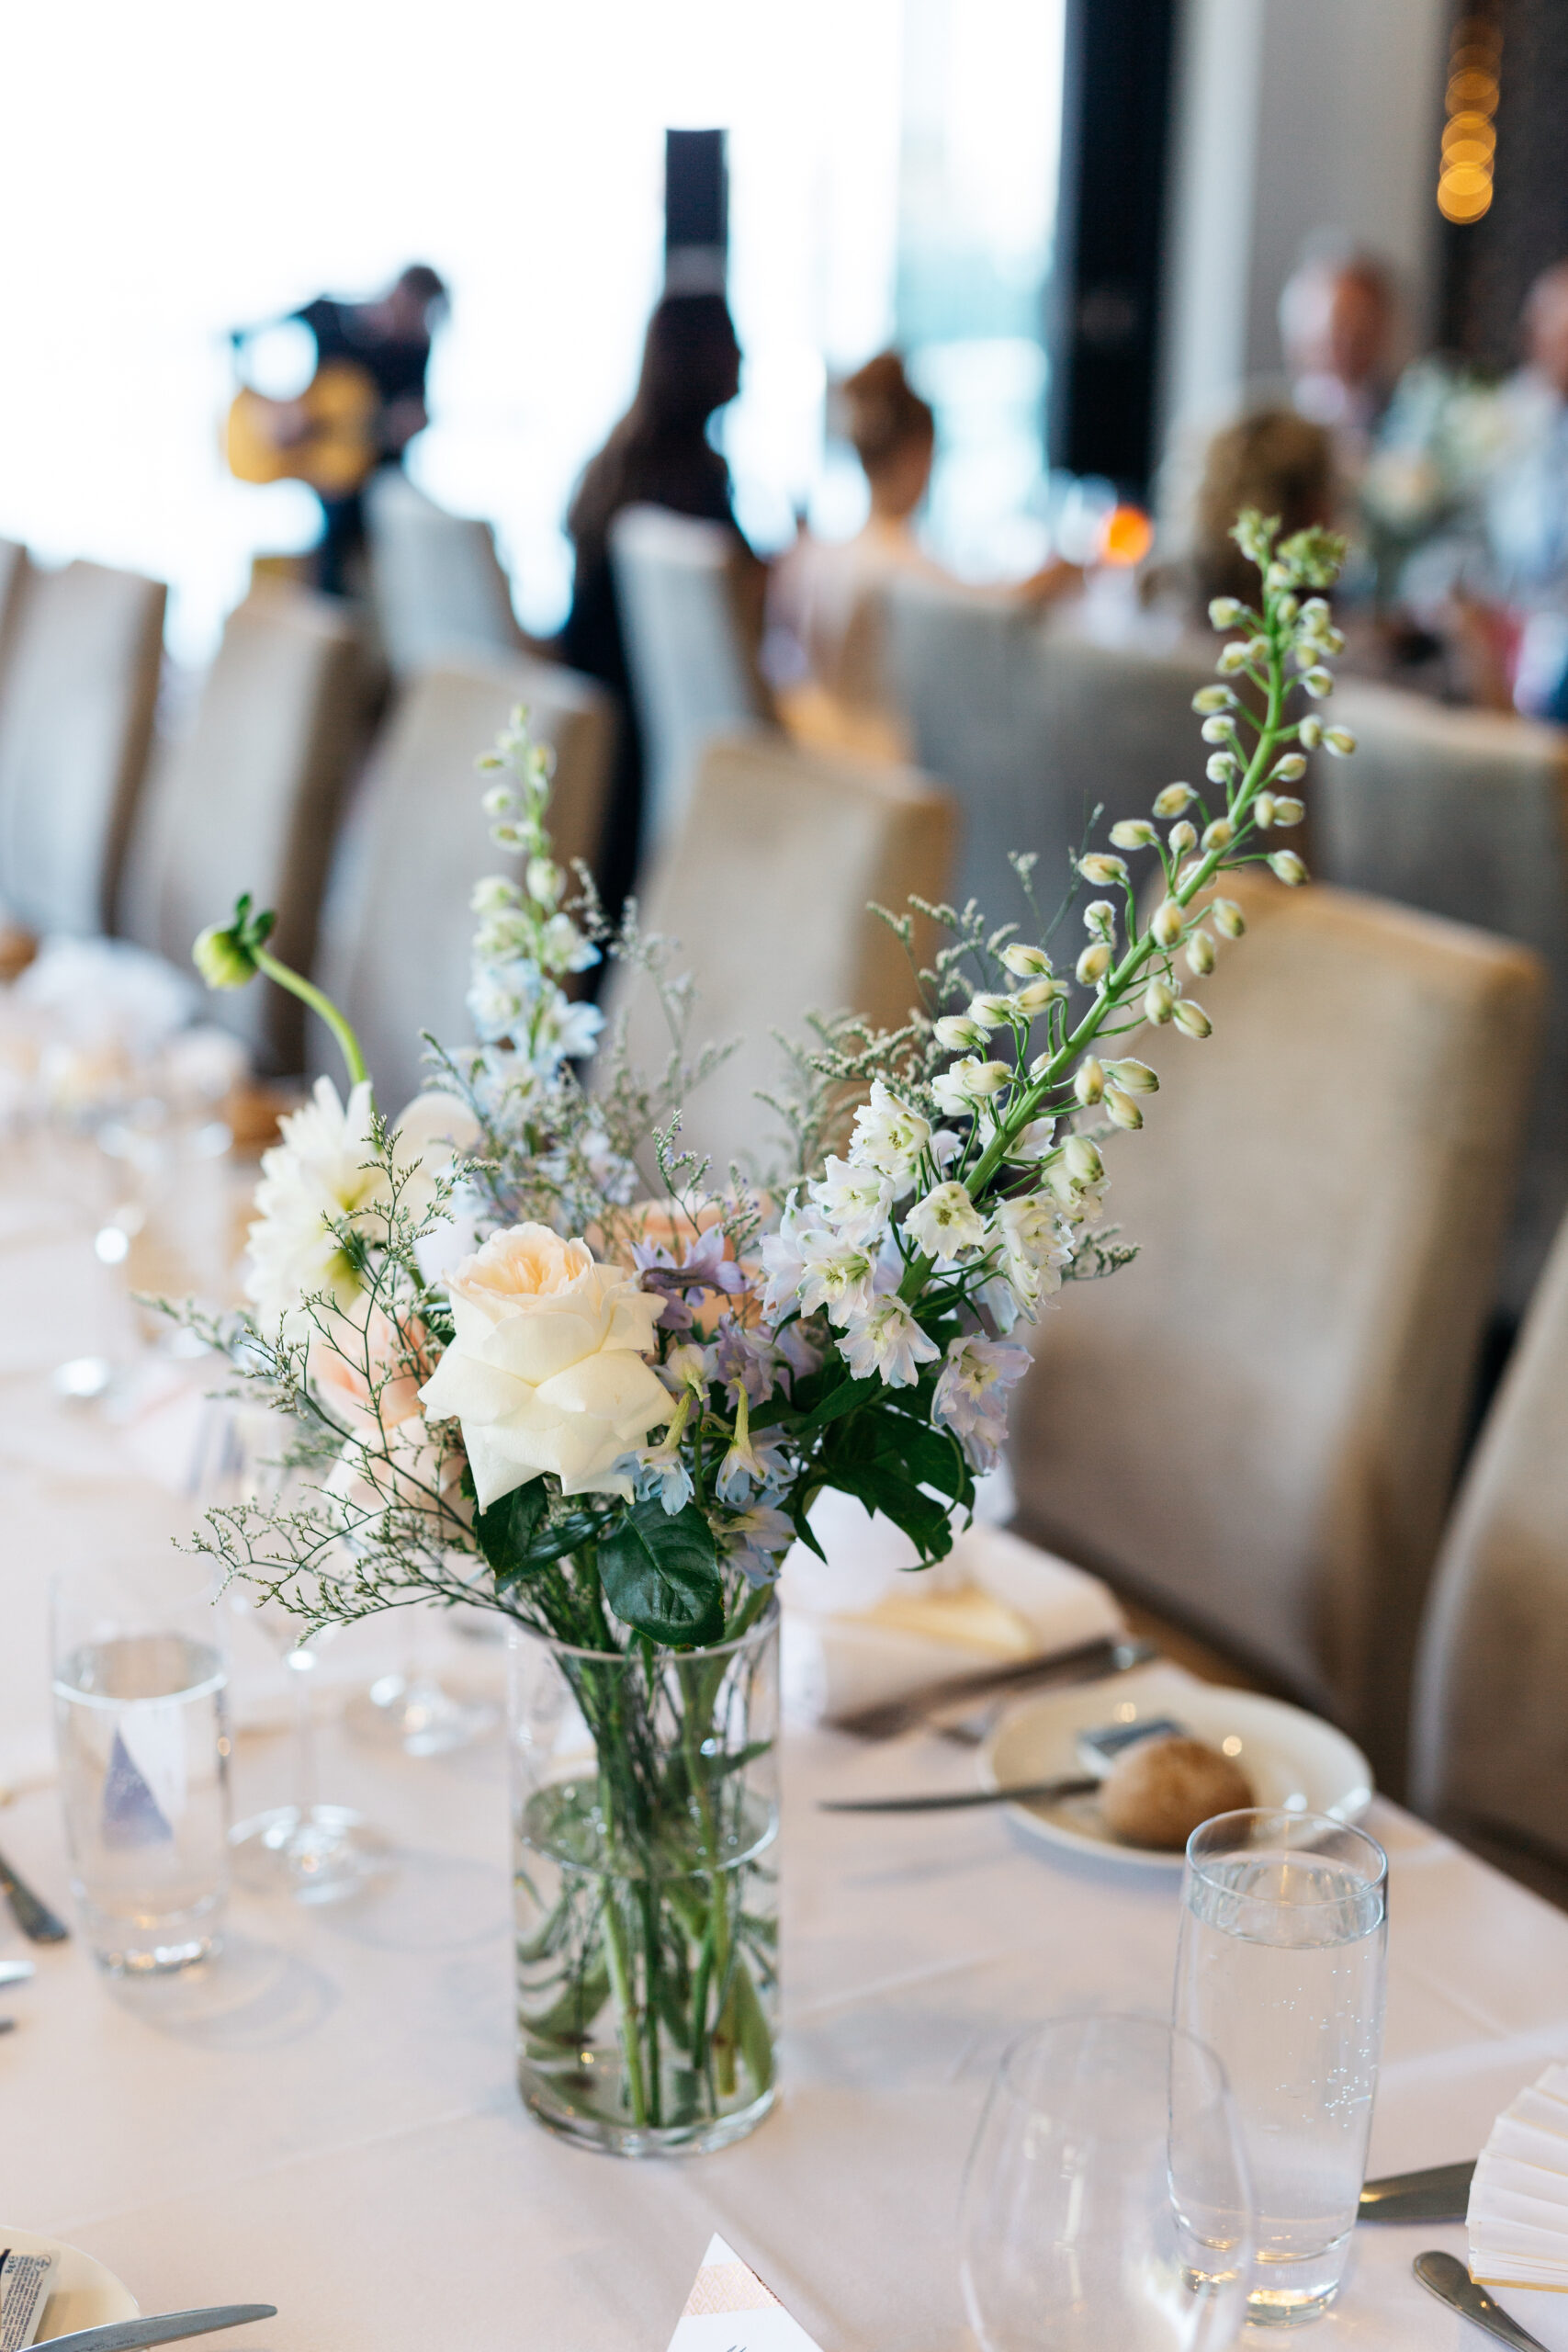 wedding table centerpiece | Tumbleweed Events